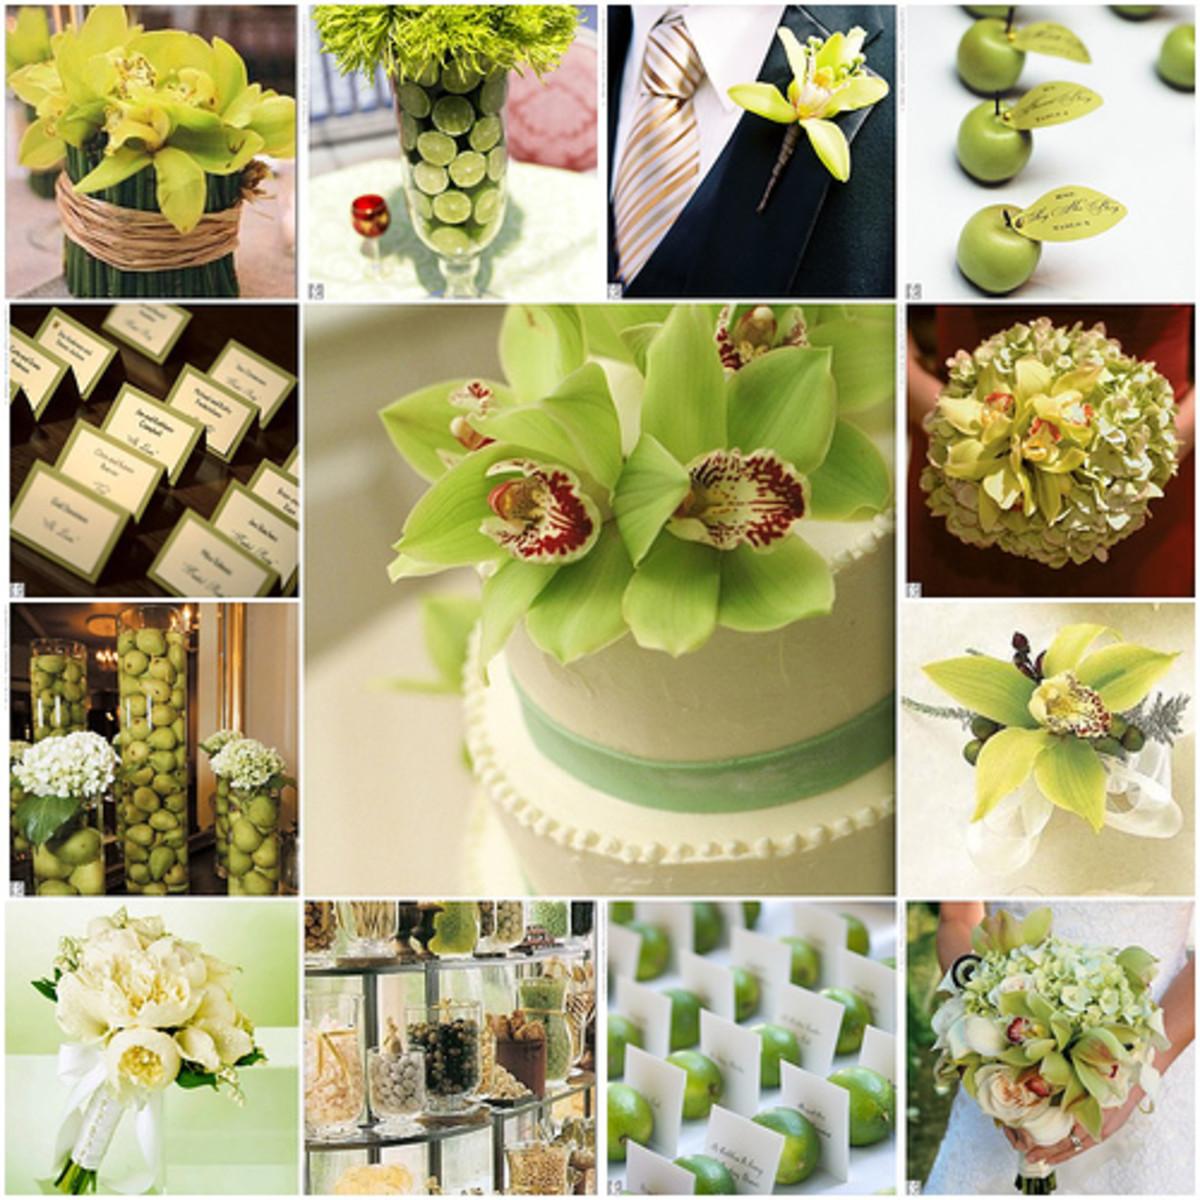 photo credit: weddingwindow.com